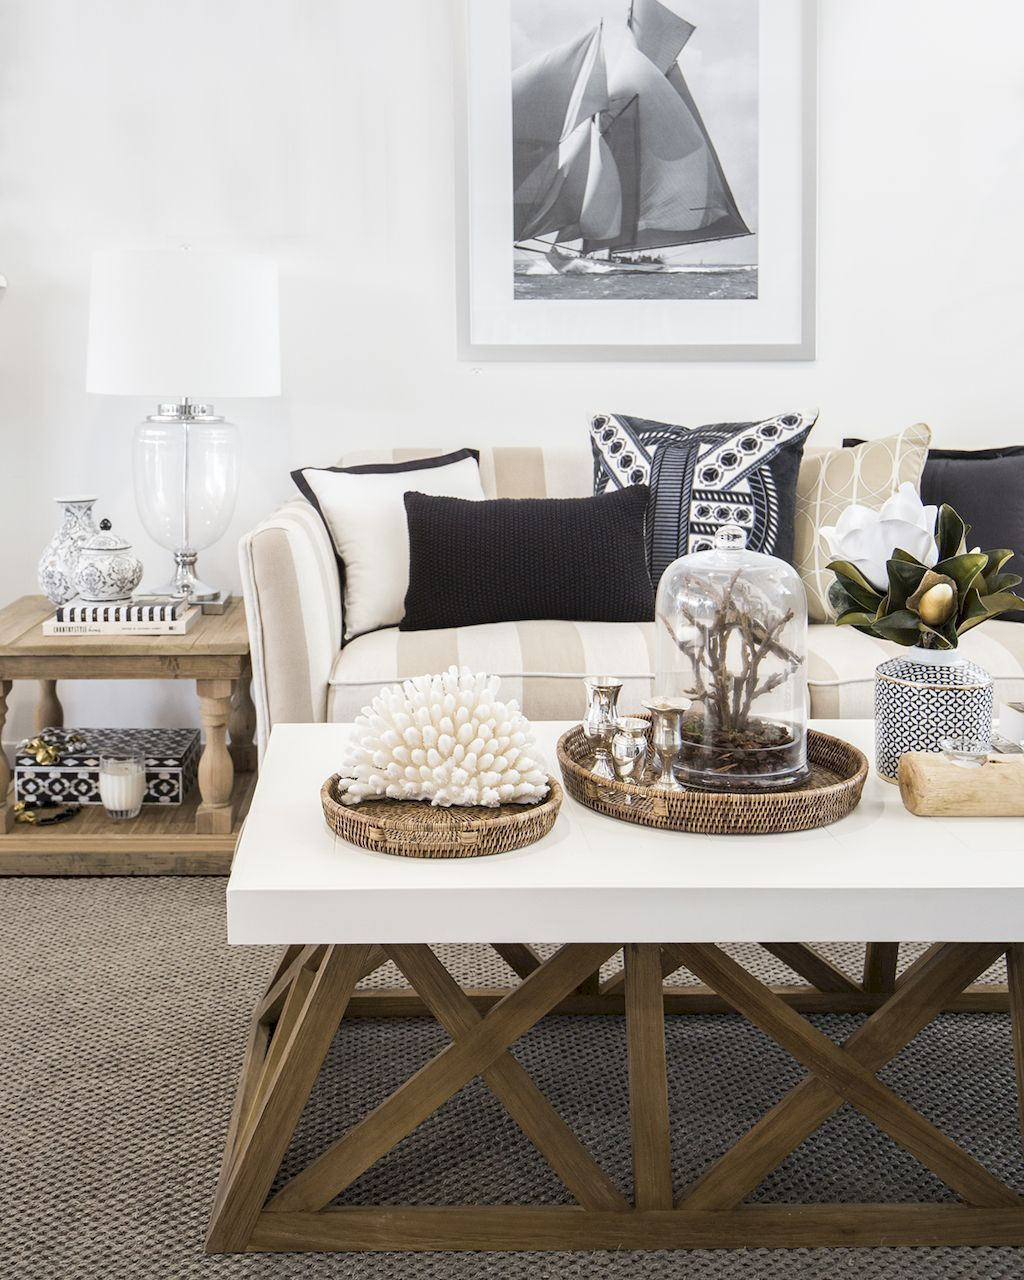 Cozy coastal living room decorating ideas also hampton style rh pinterest